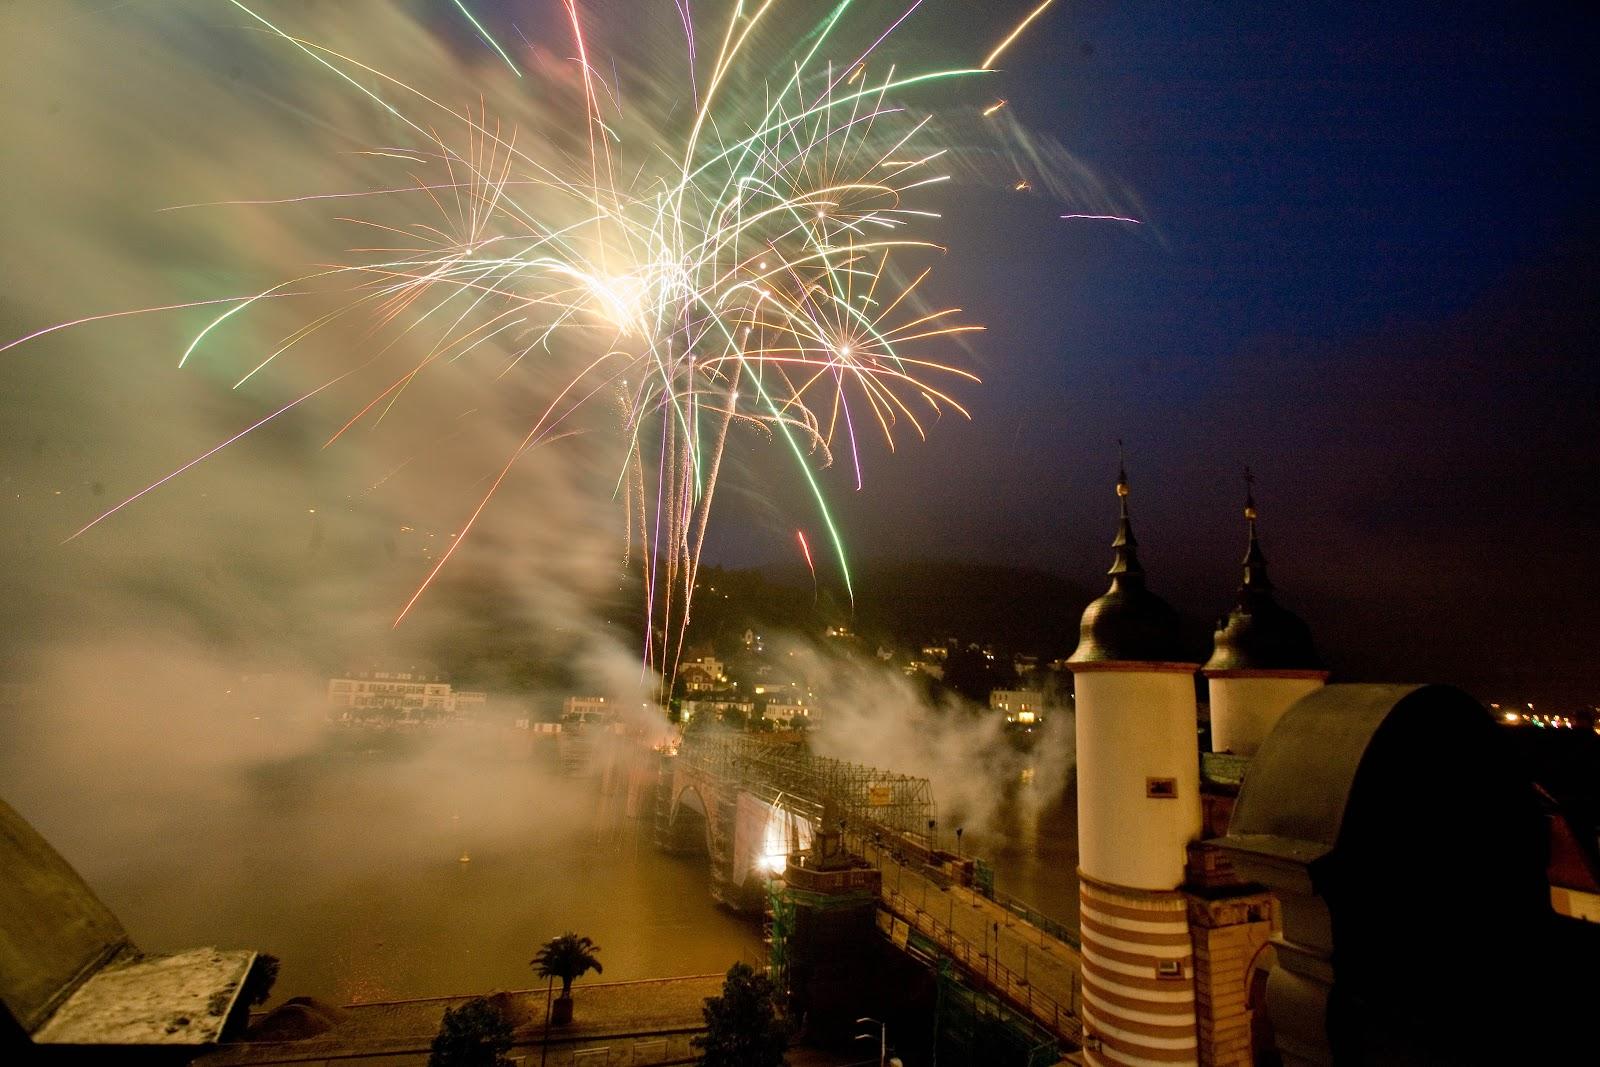 Heidelberg erleben: Heidelberger Schlossbeleuchtung